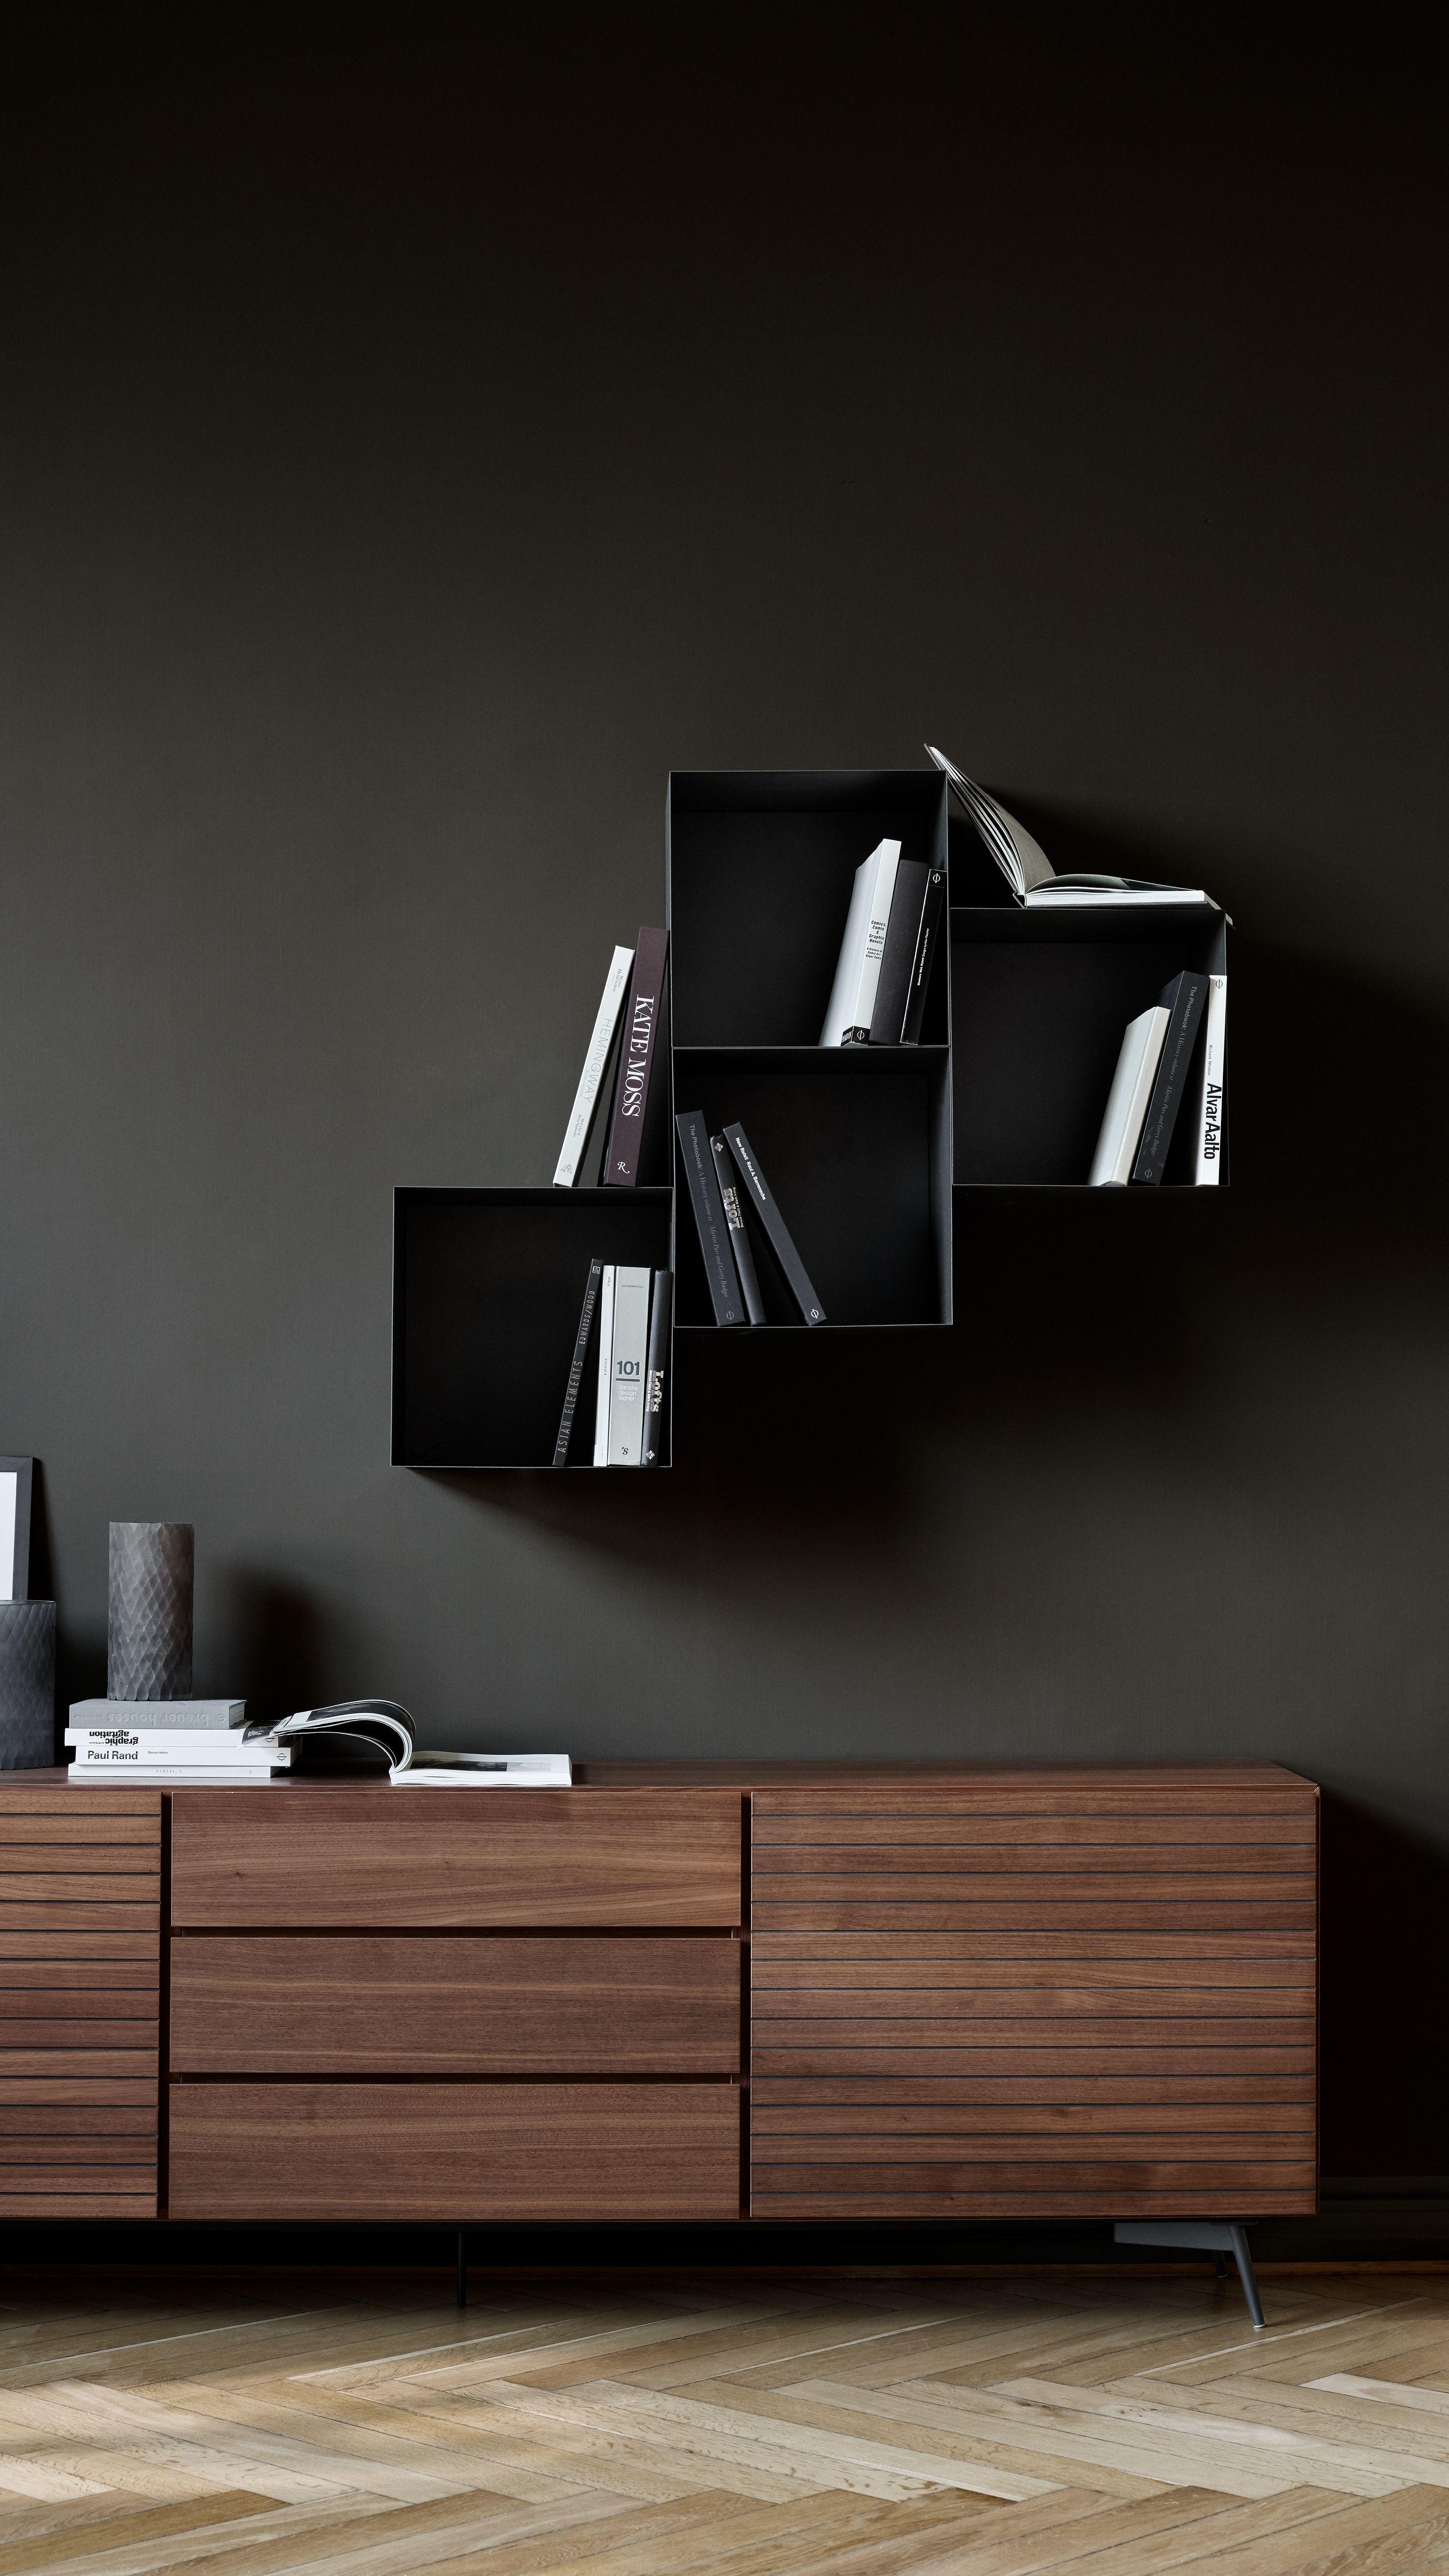 Pin by Runsu Deng on Olohuone | Furniture, Living room